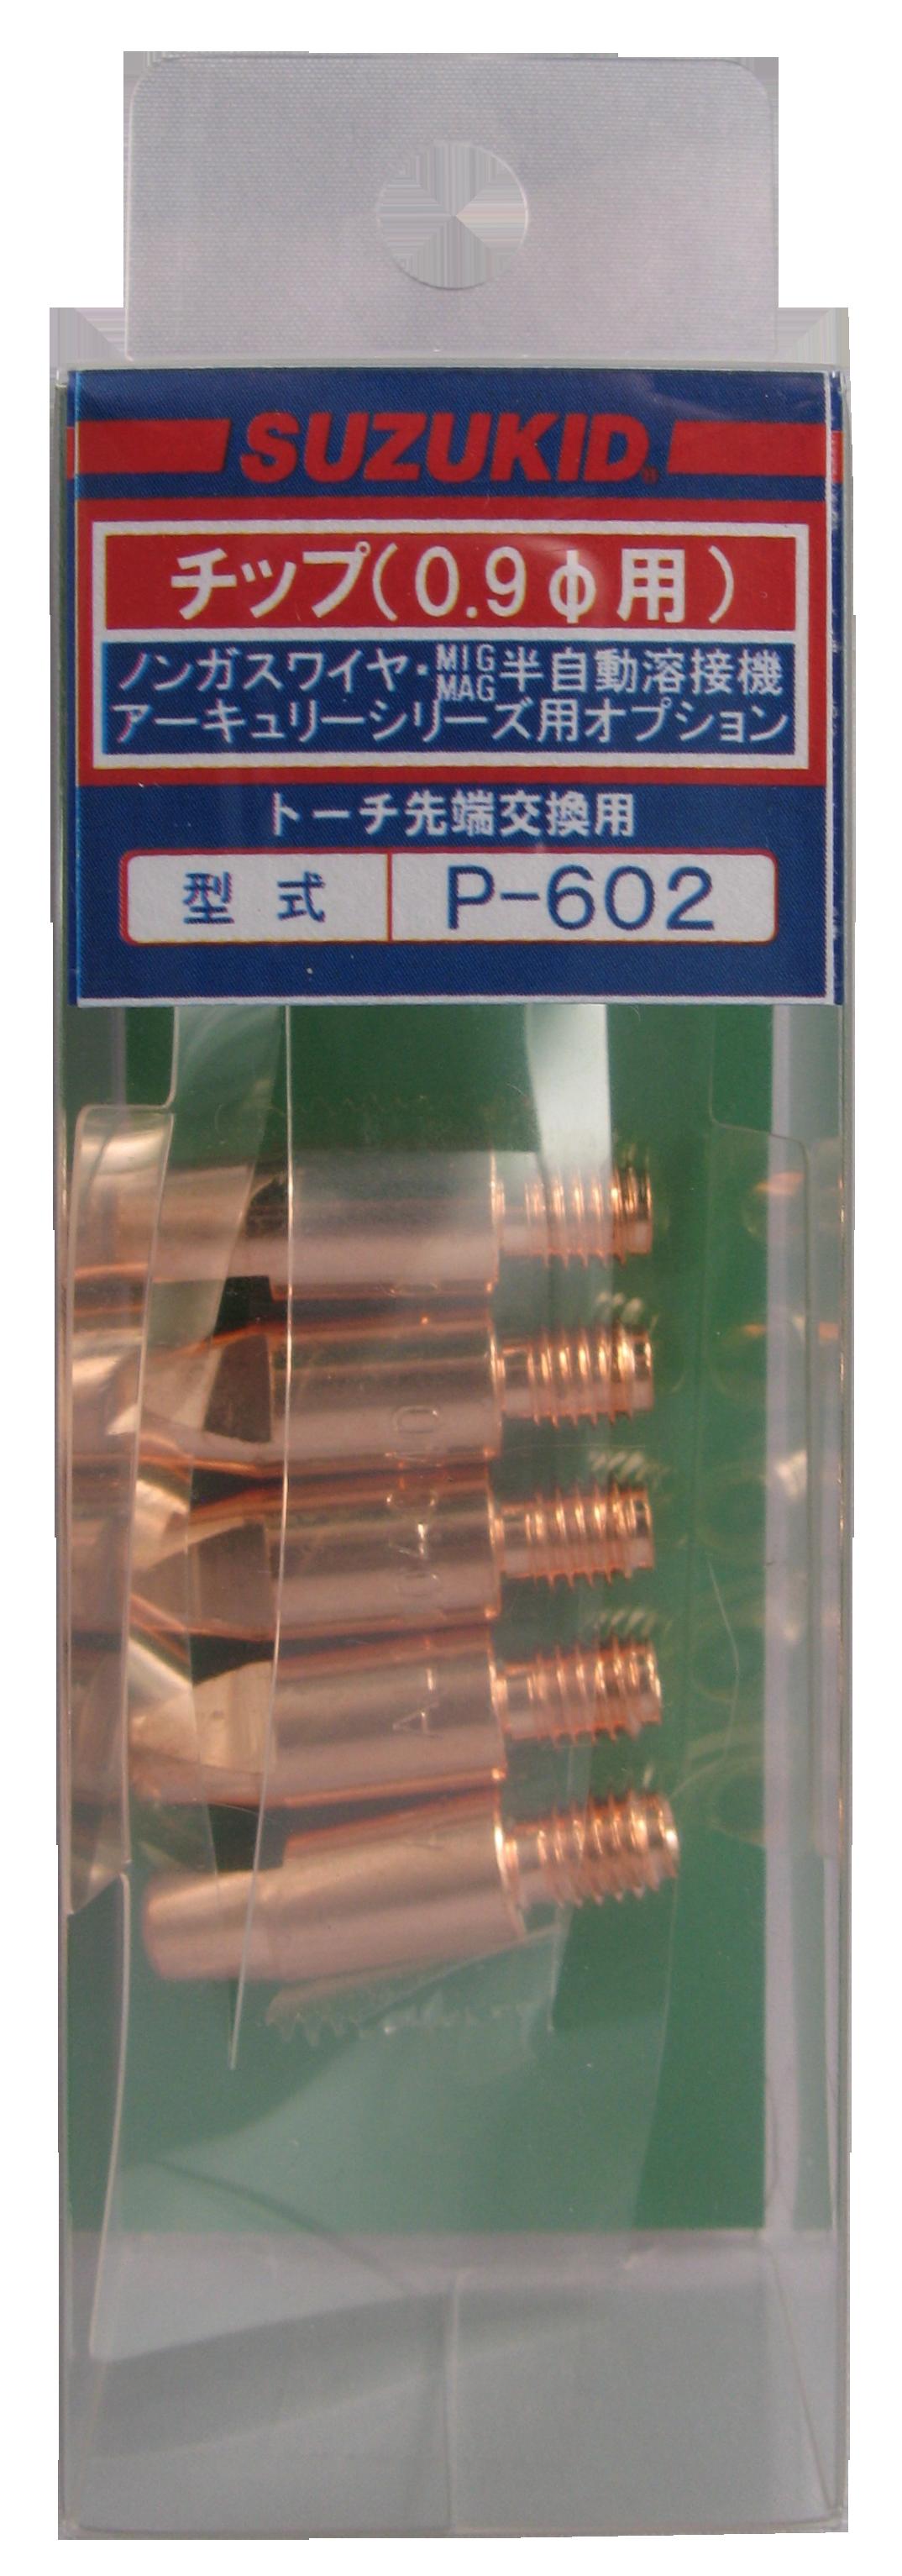 P-602